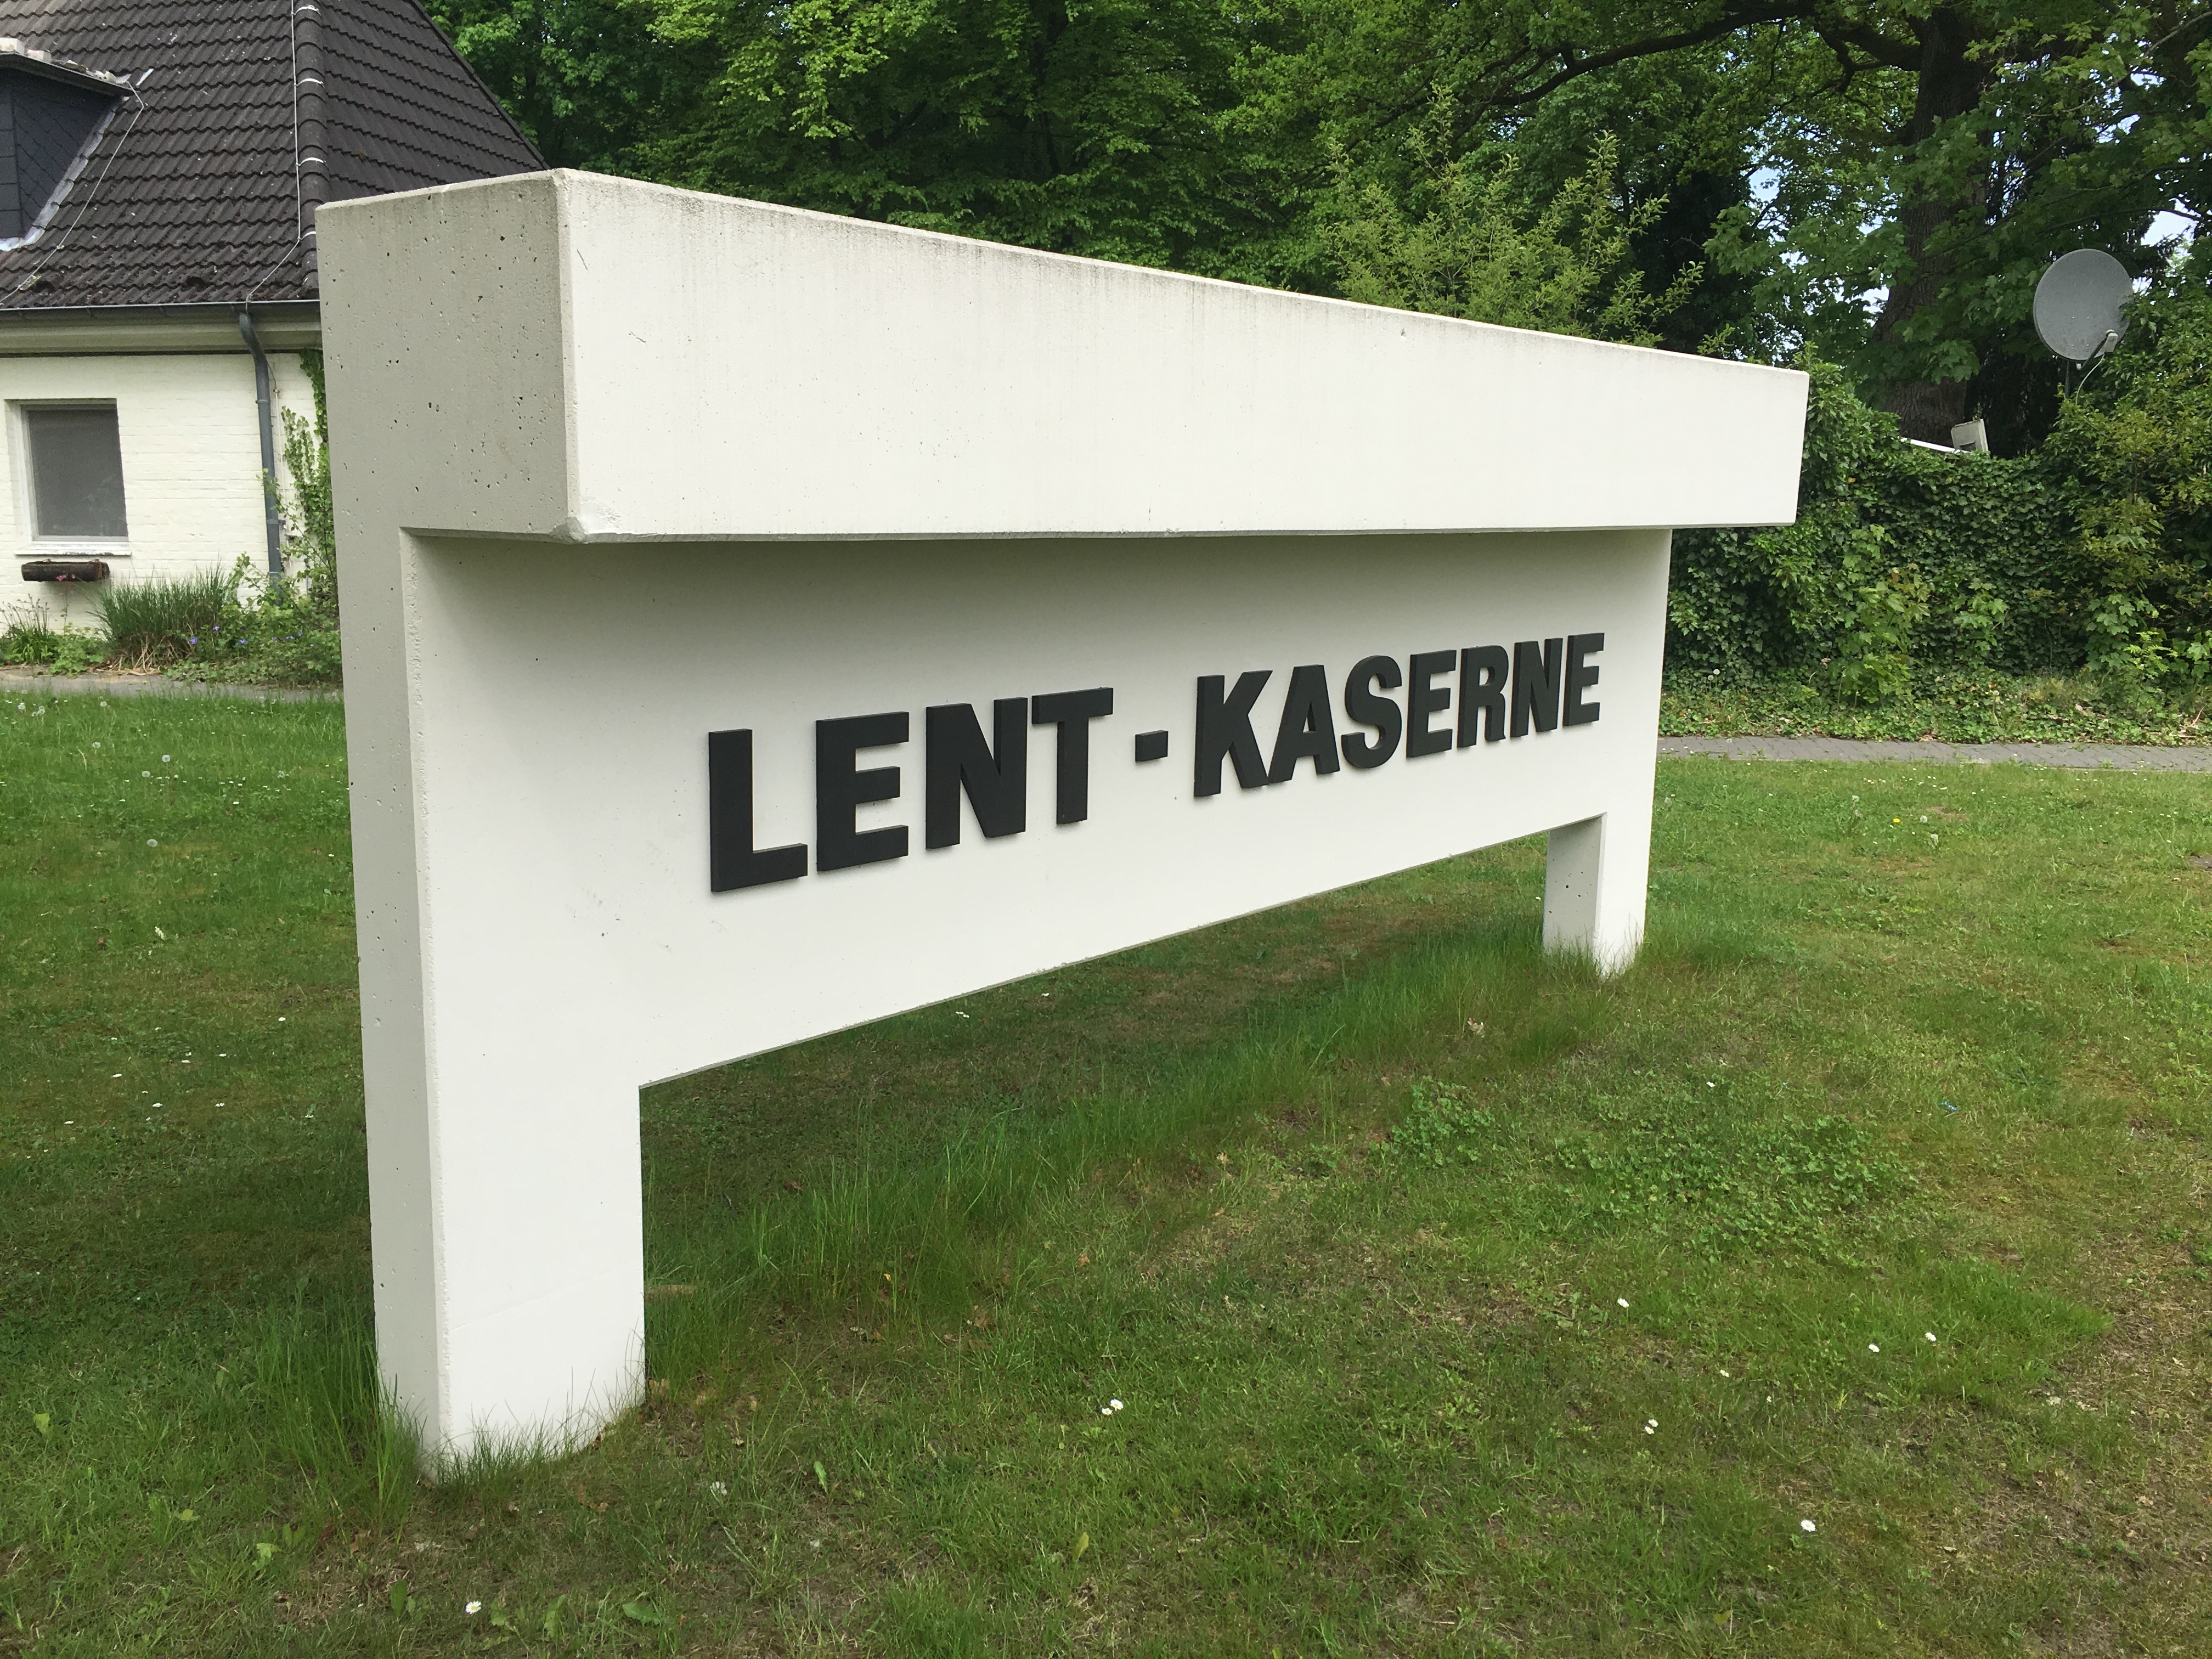 Lent kollidiert mit dem Traditionserlass den v.d. Leyen verabschieden will